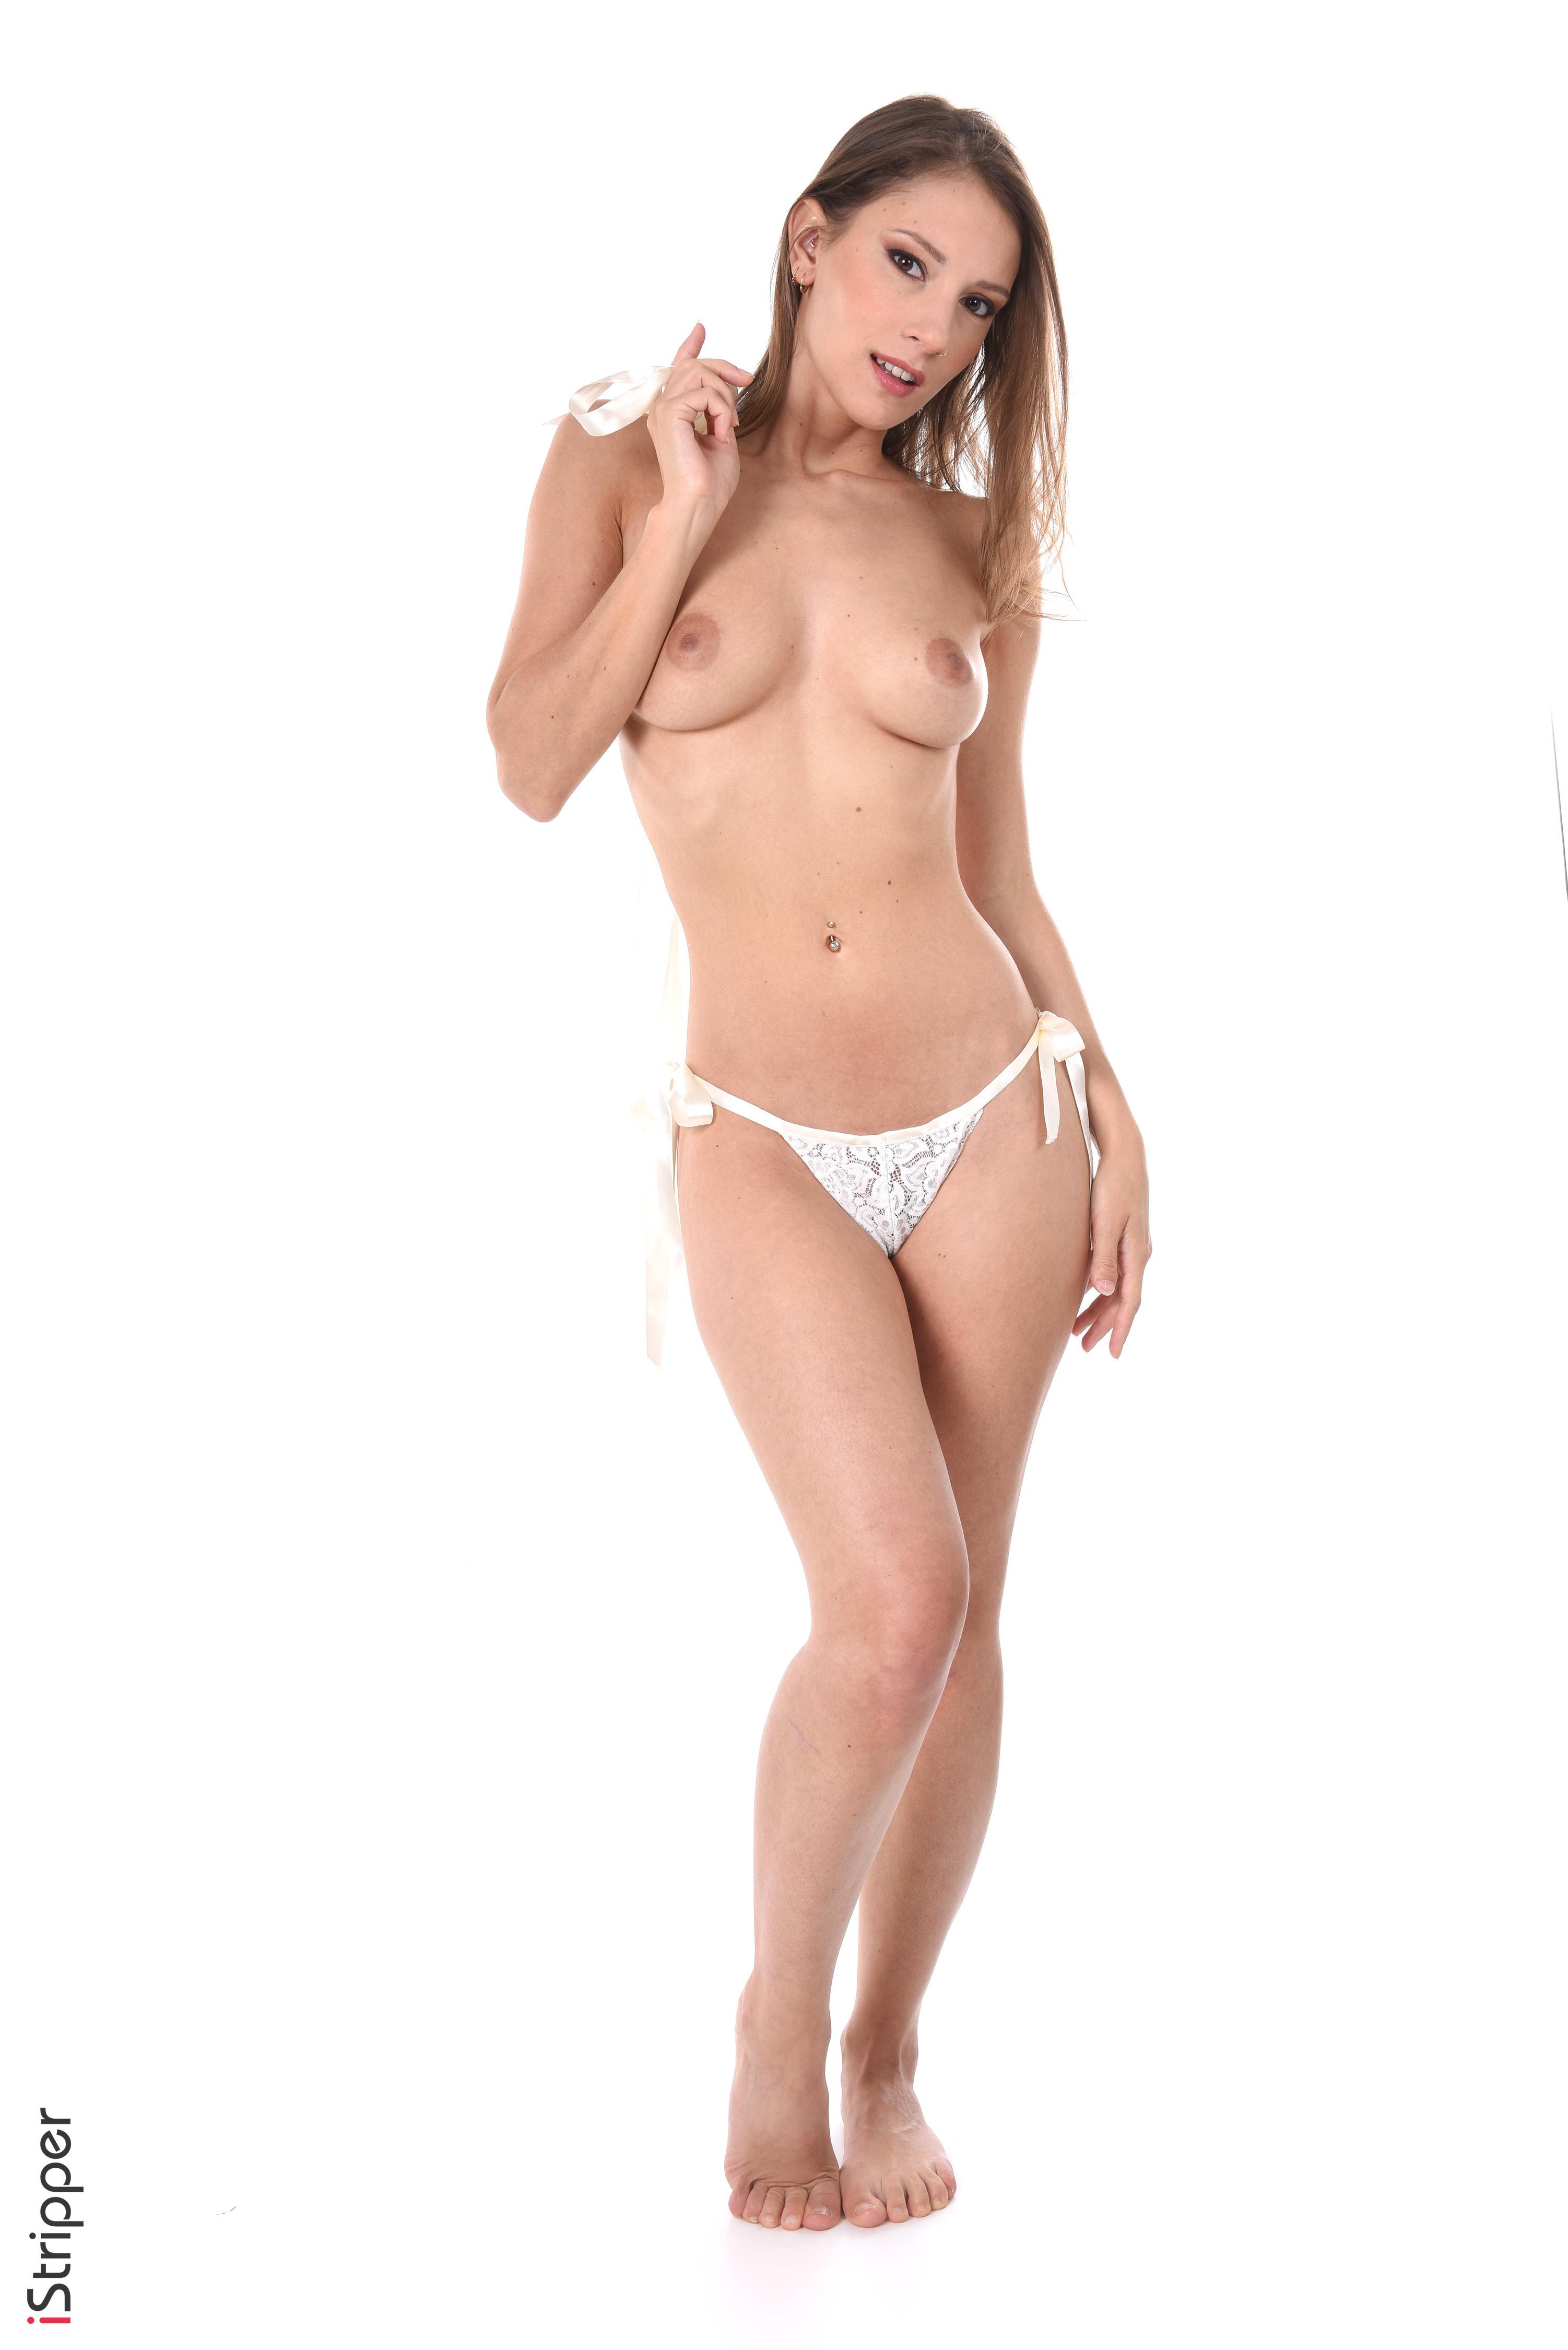 hd wallpapers nude erotic